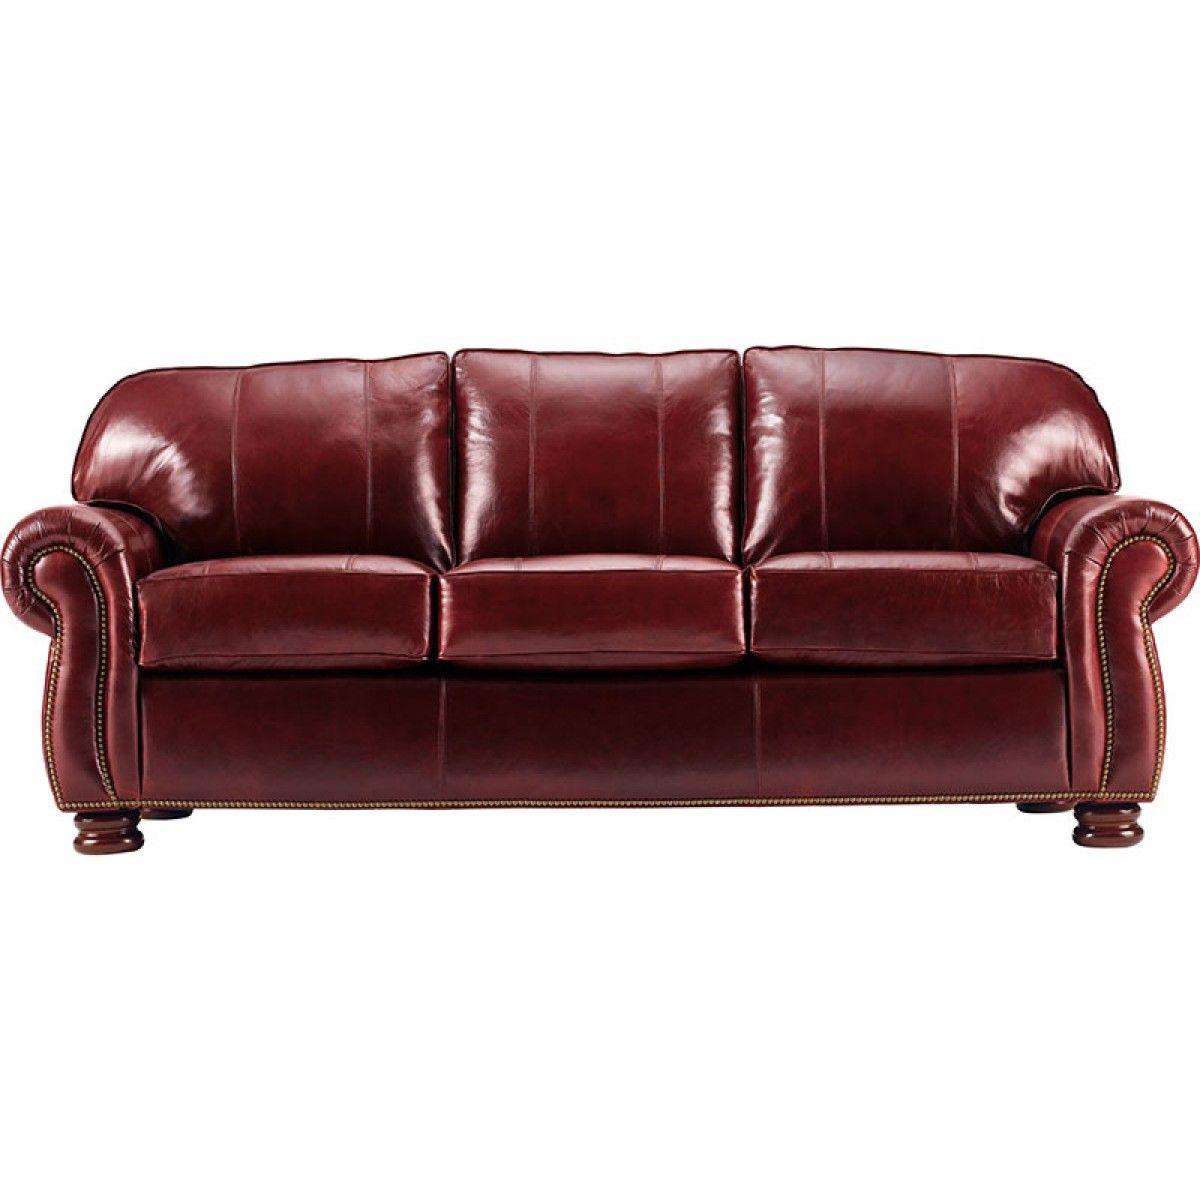 Thomasville Benjamin Sofa Leather Manufacturers Usa Furniture Gradschoolfairs